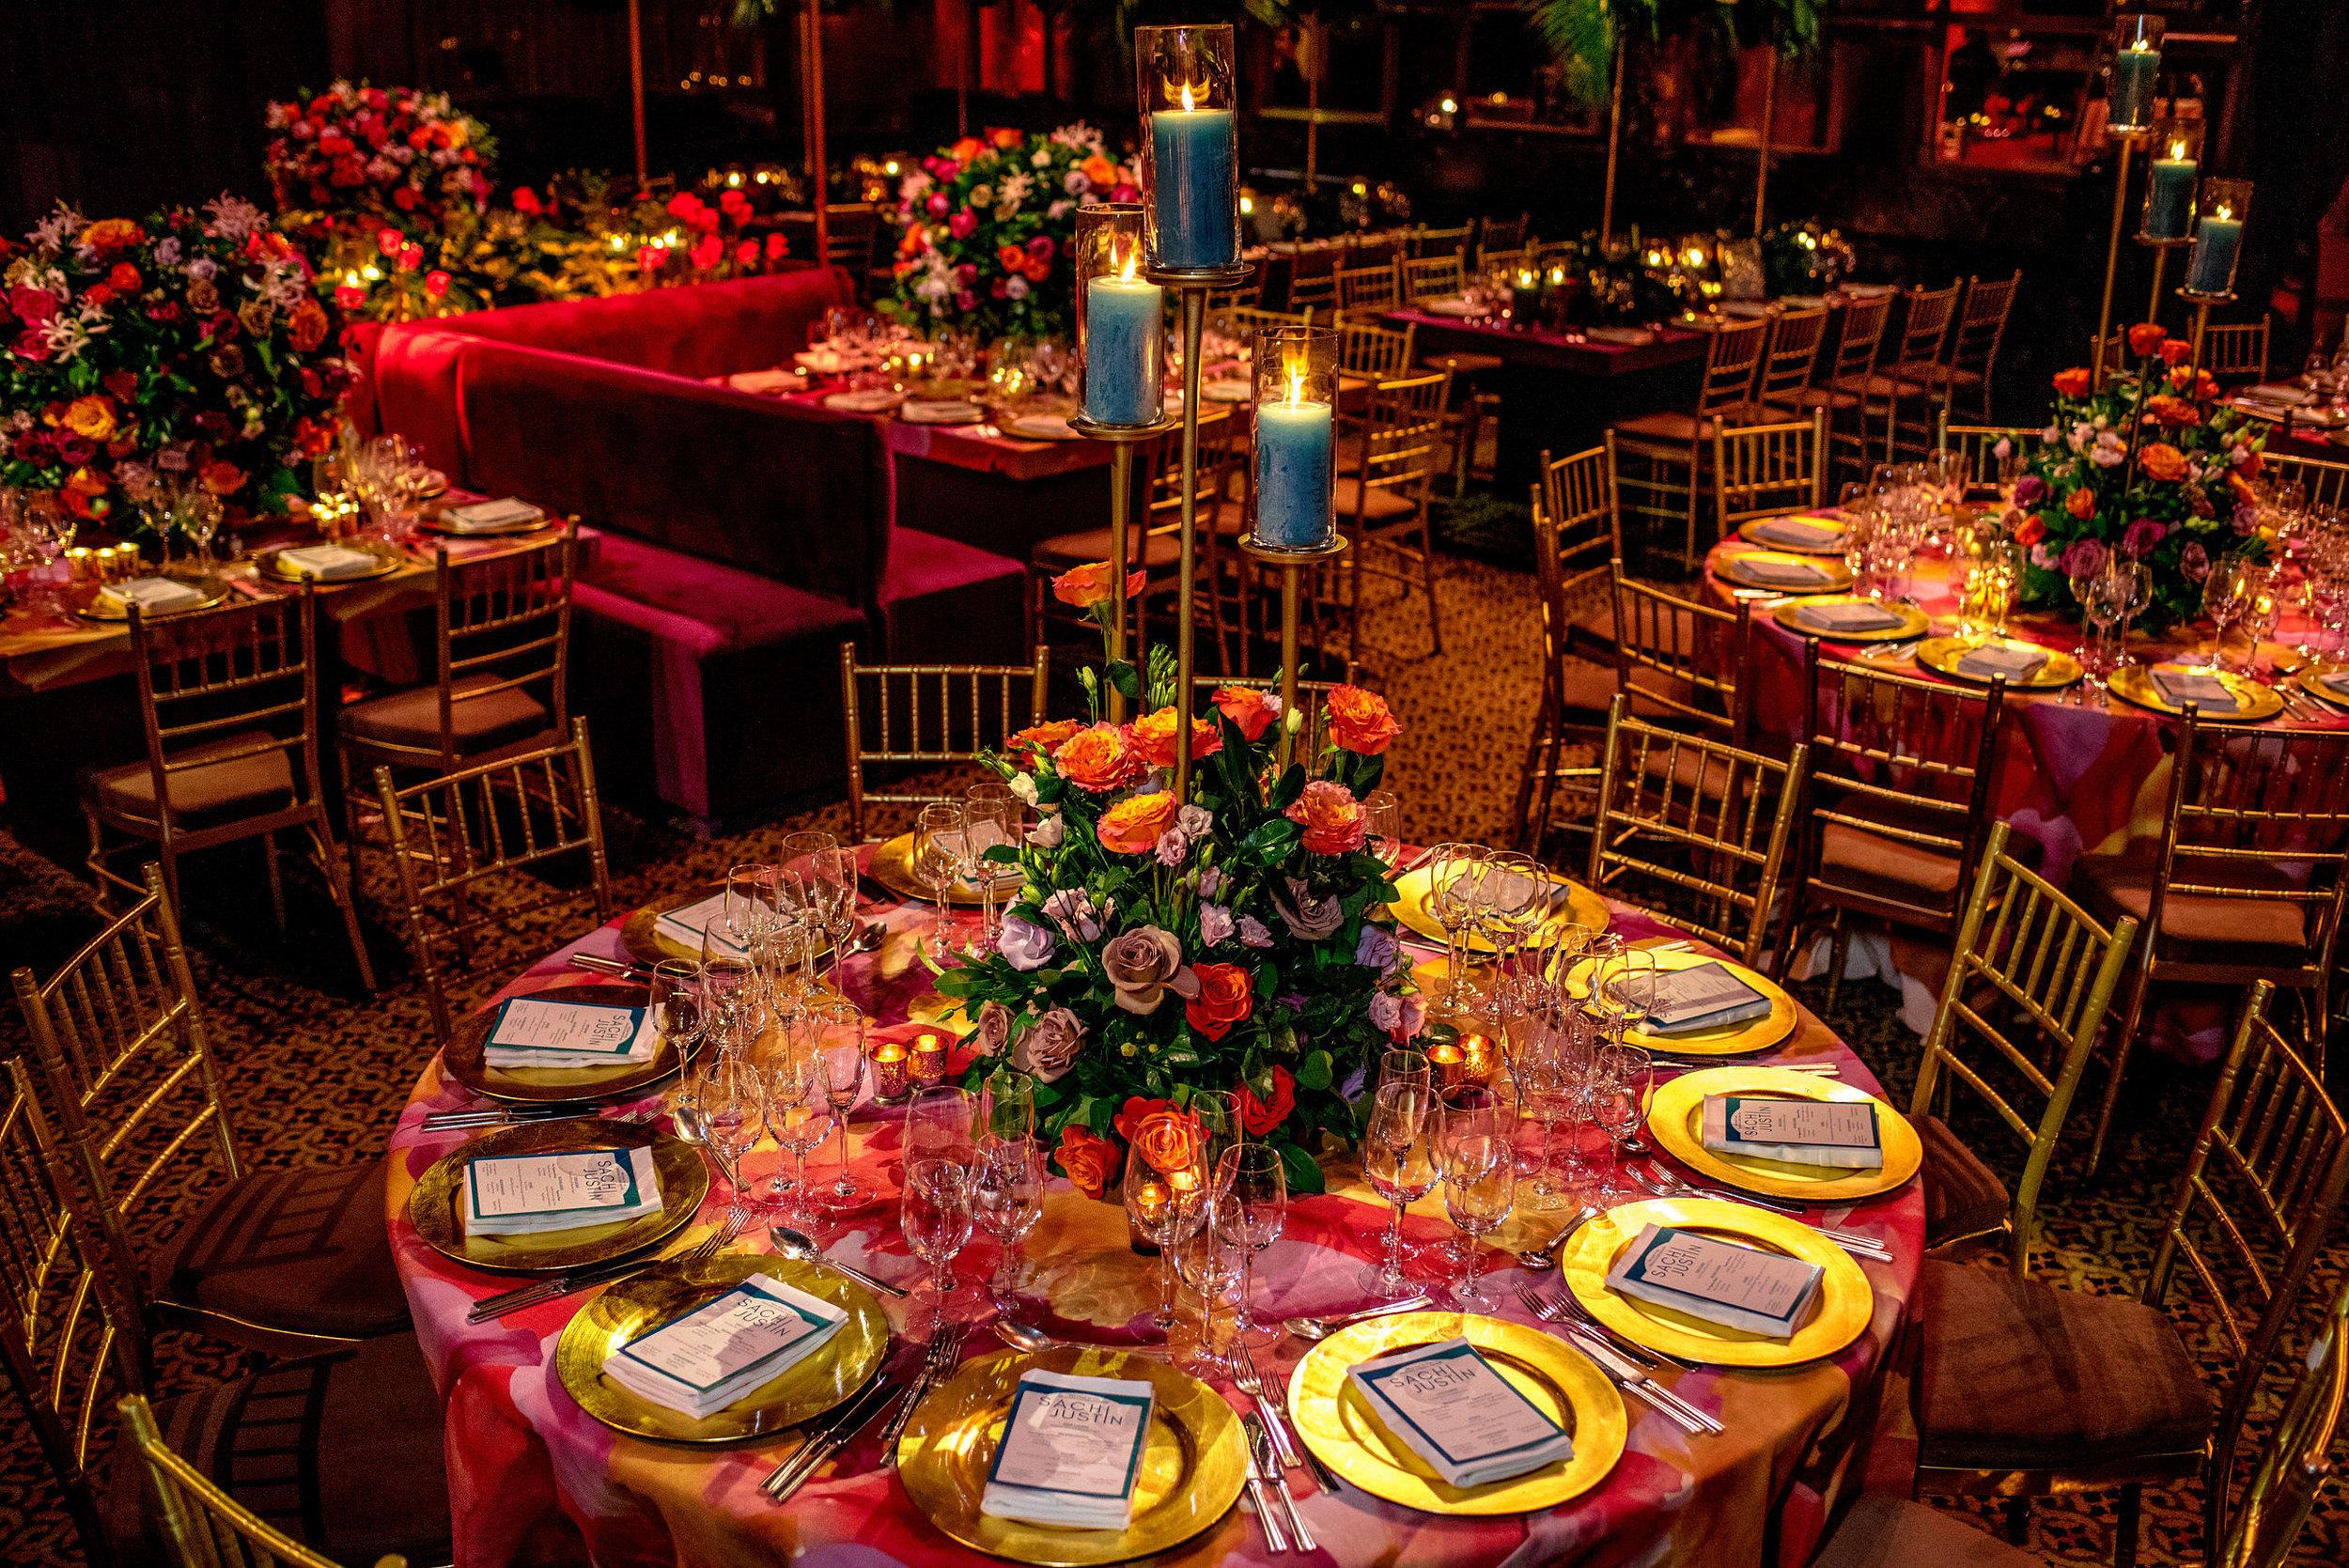 INDIAN WEDDING TABLE DECOR3.JPG